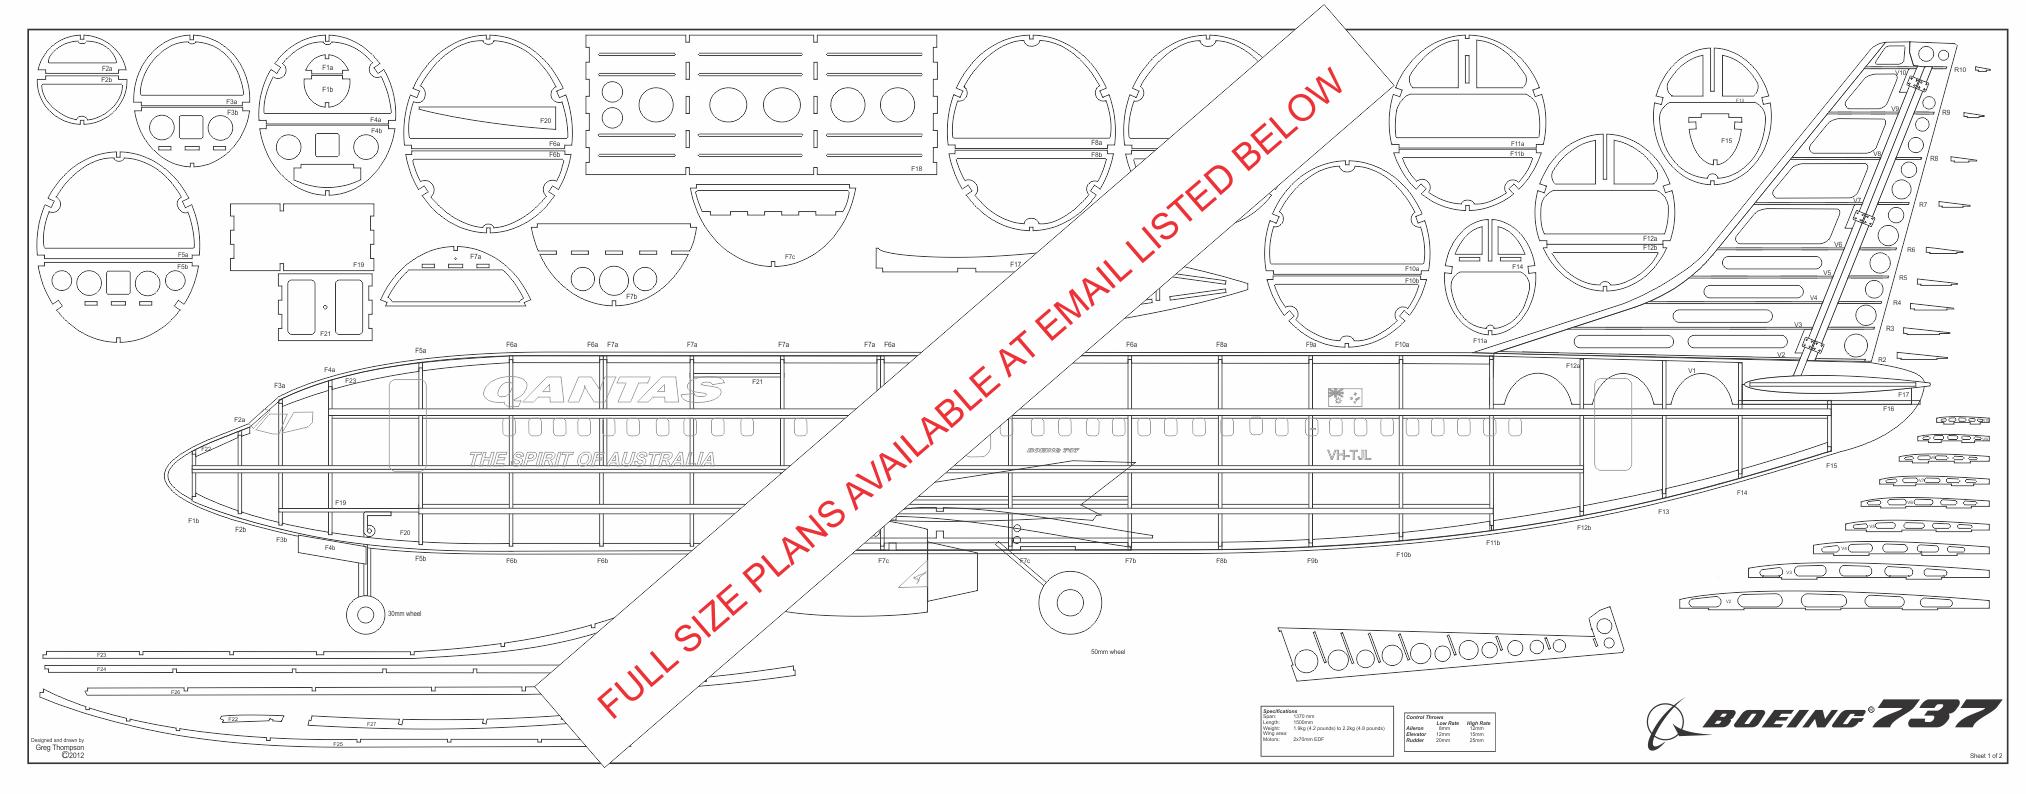 Boeing 737 Laser Design Services